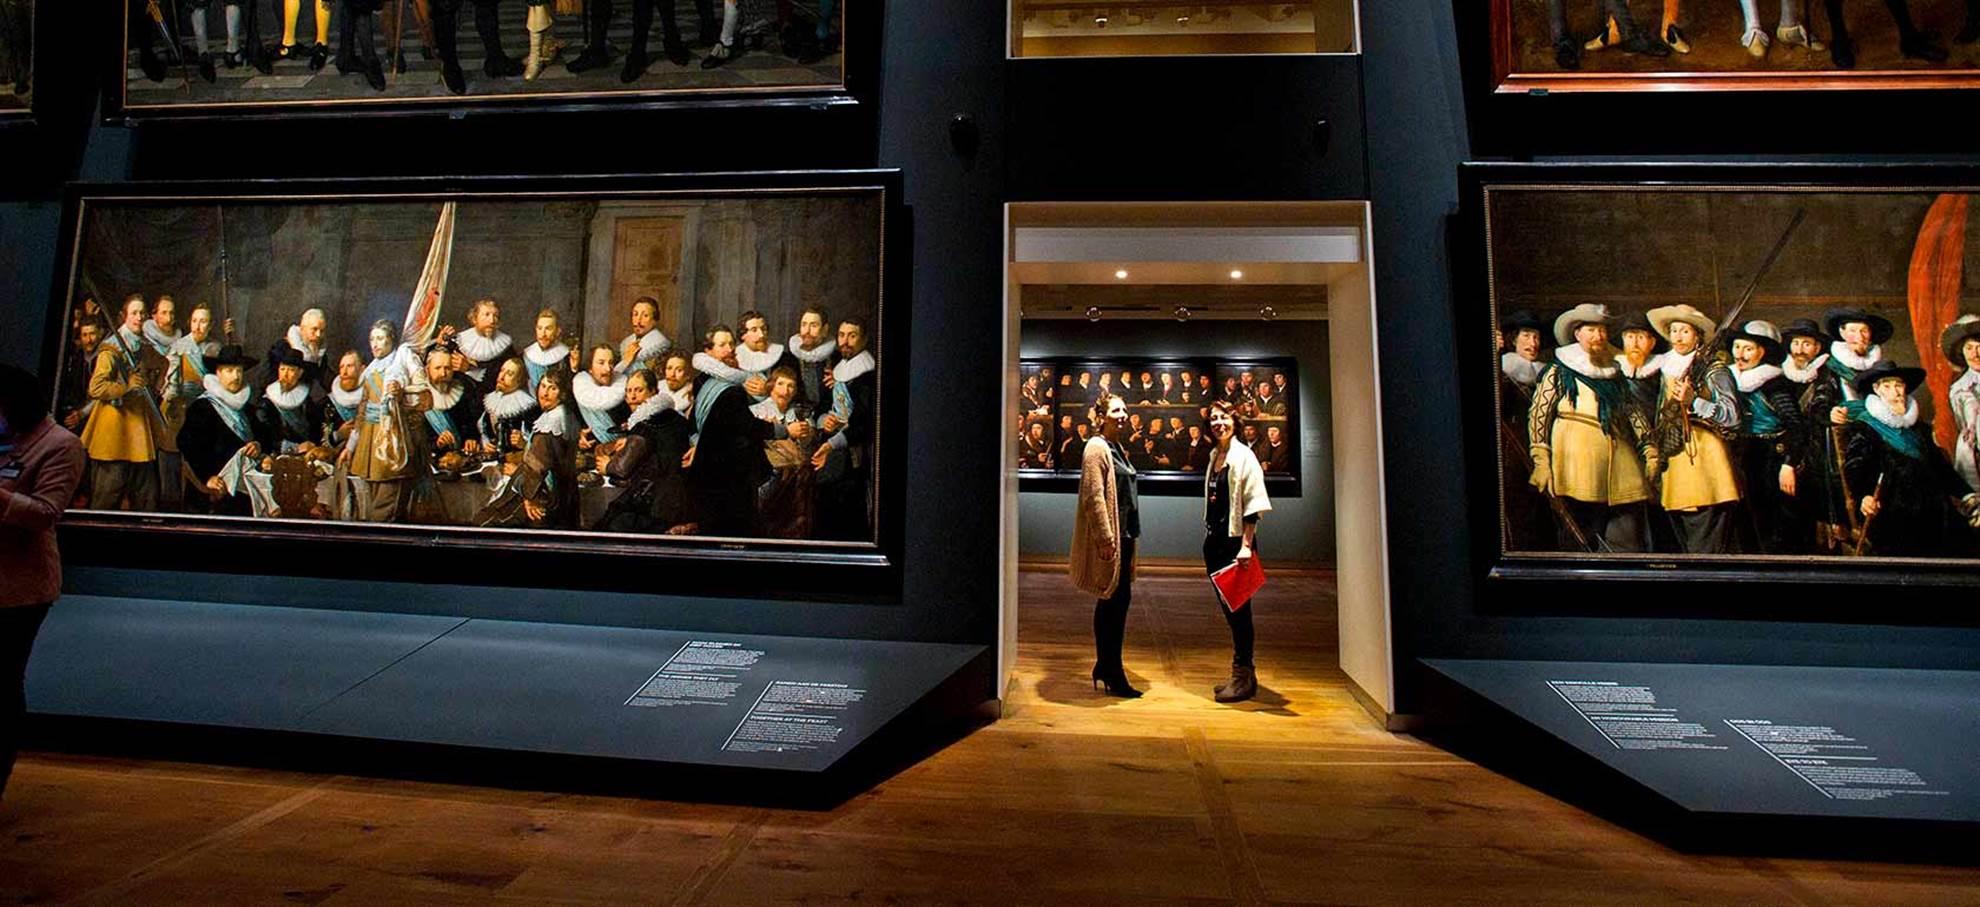 Porträtgalerie des Goldenen Zeitalters